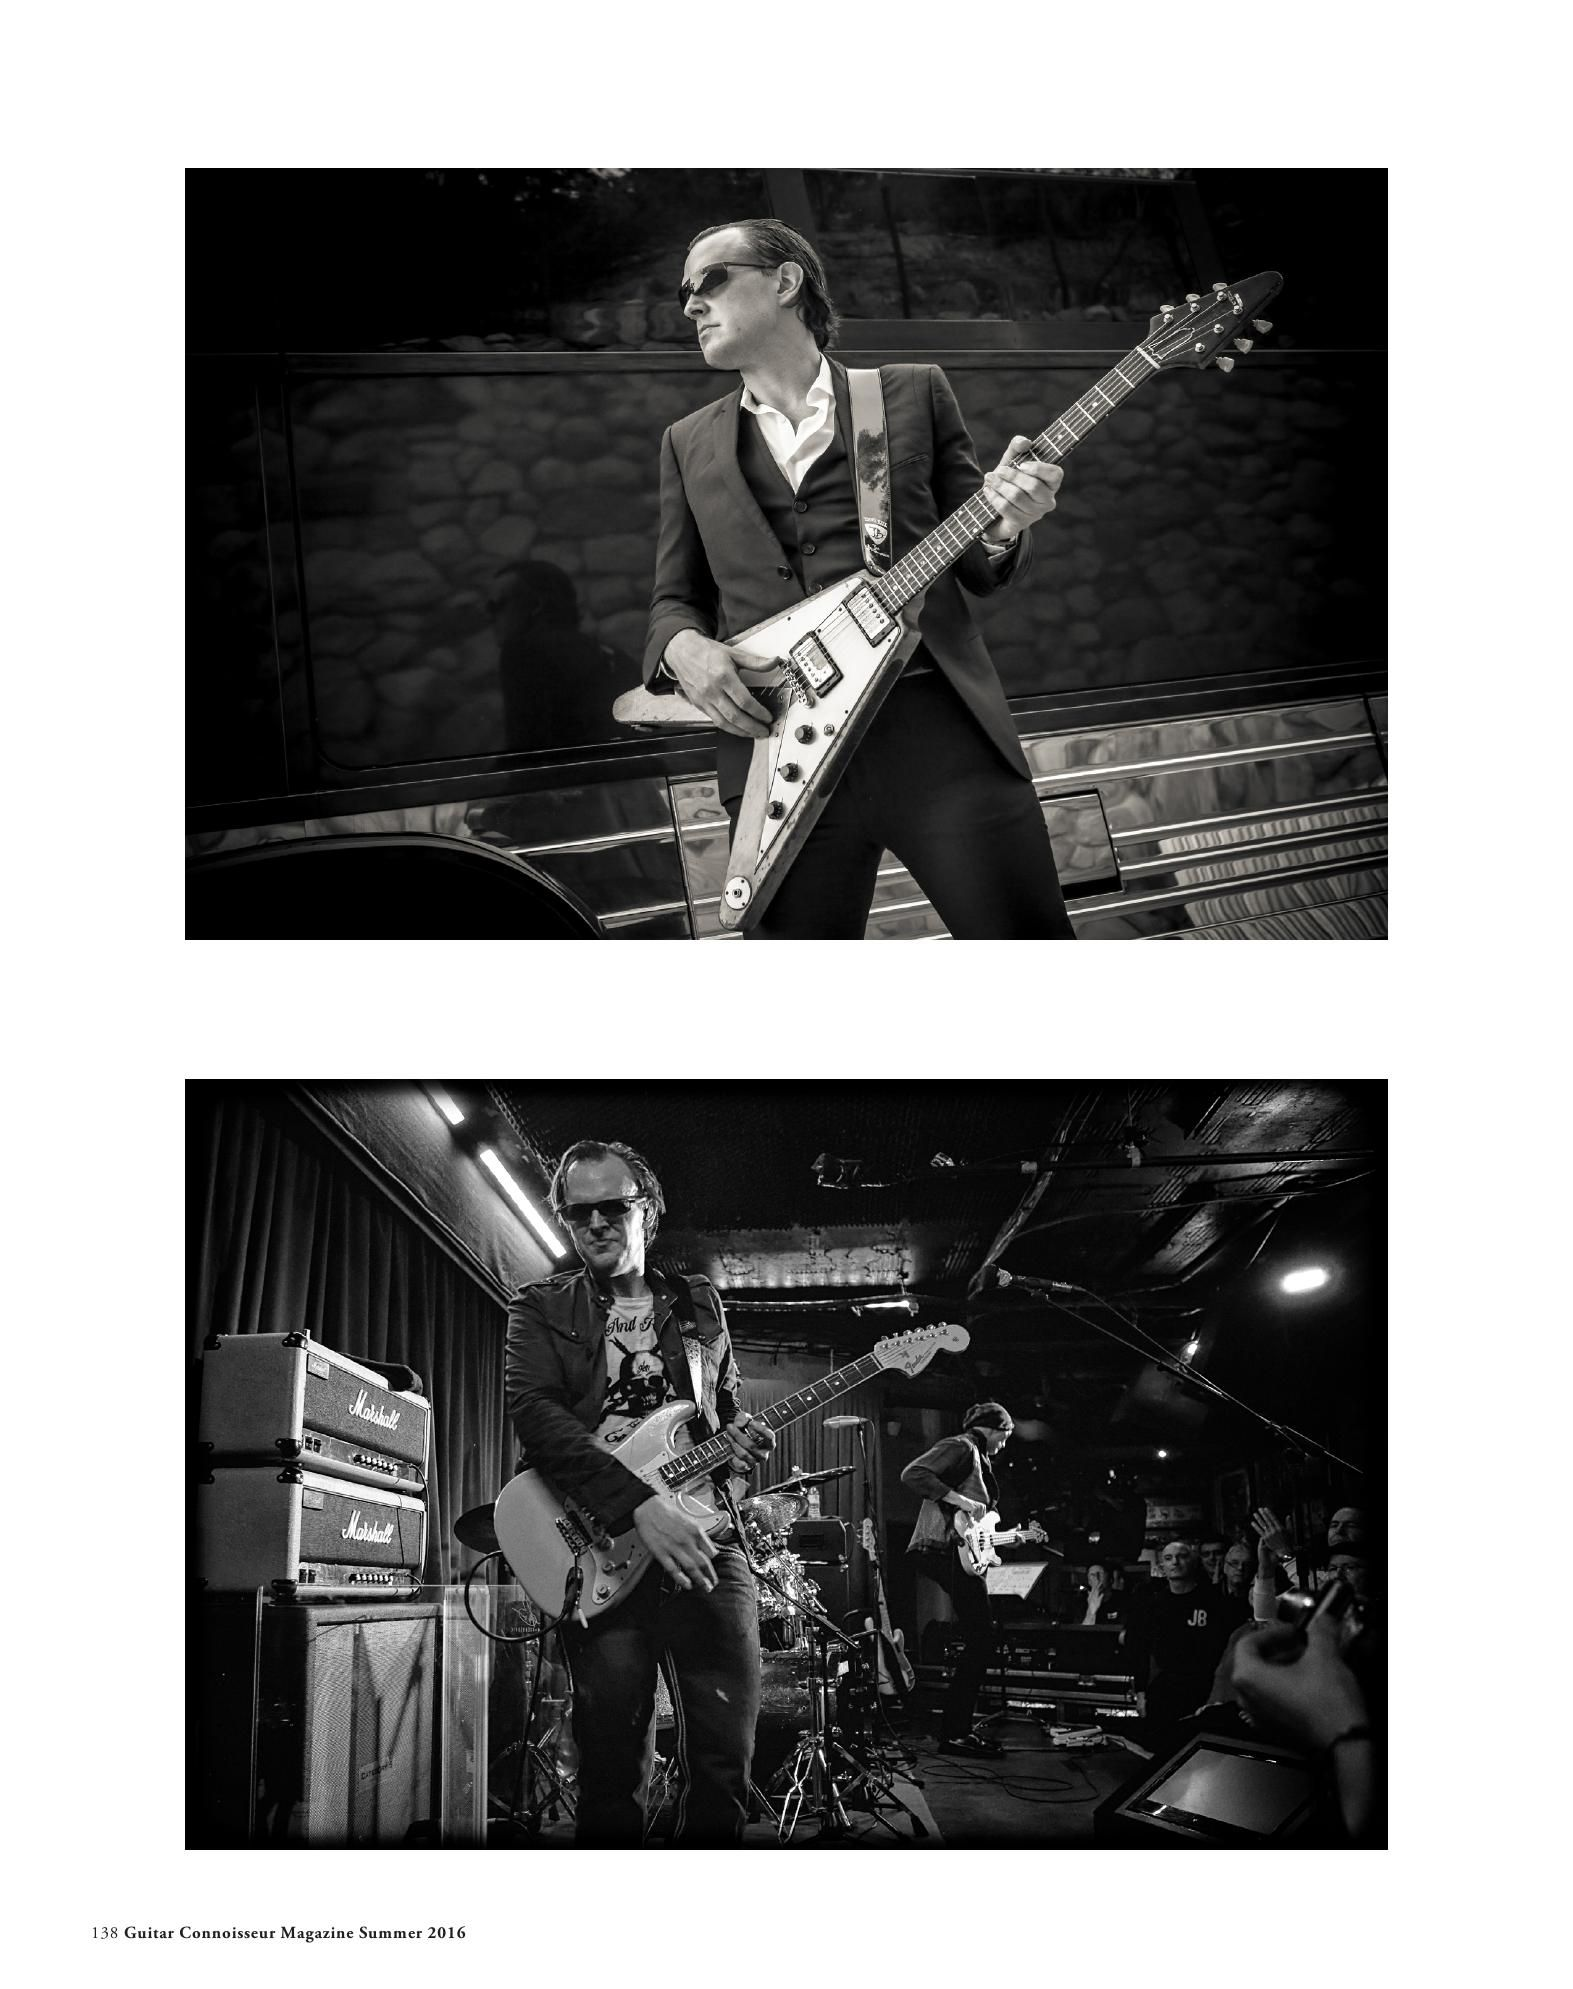 Guitar Connoisseur Magazine American Guitars Issue Summer 2016 Joe